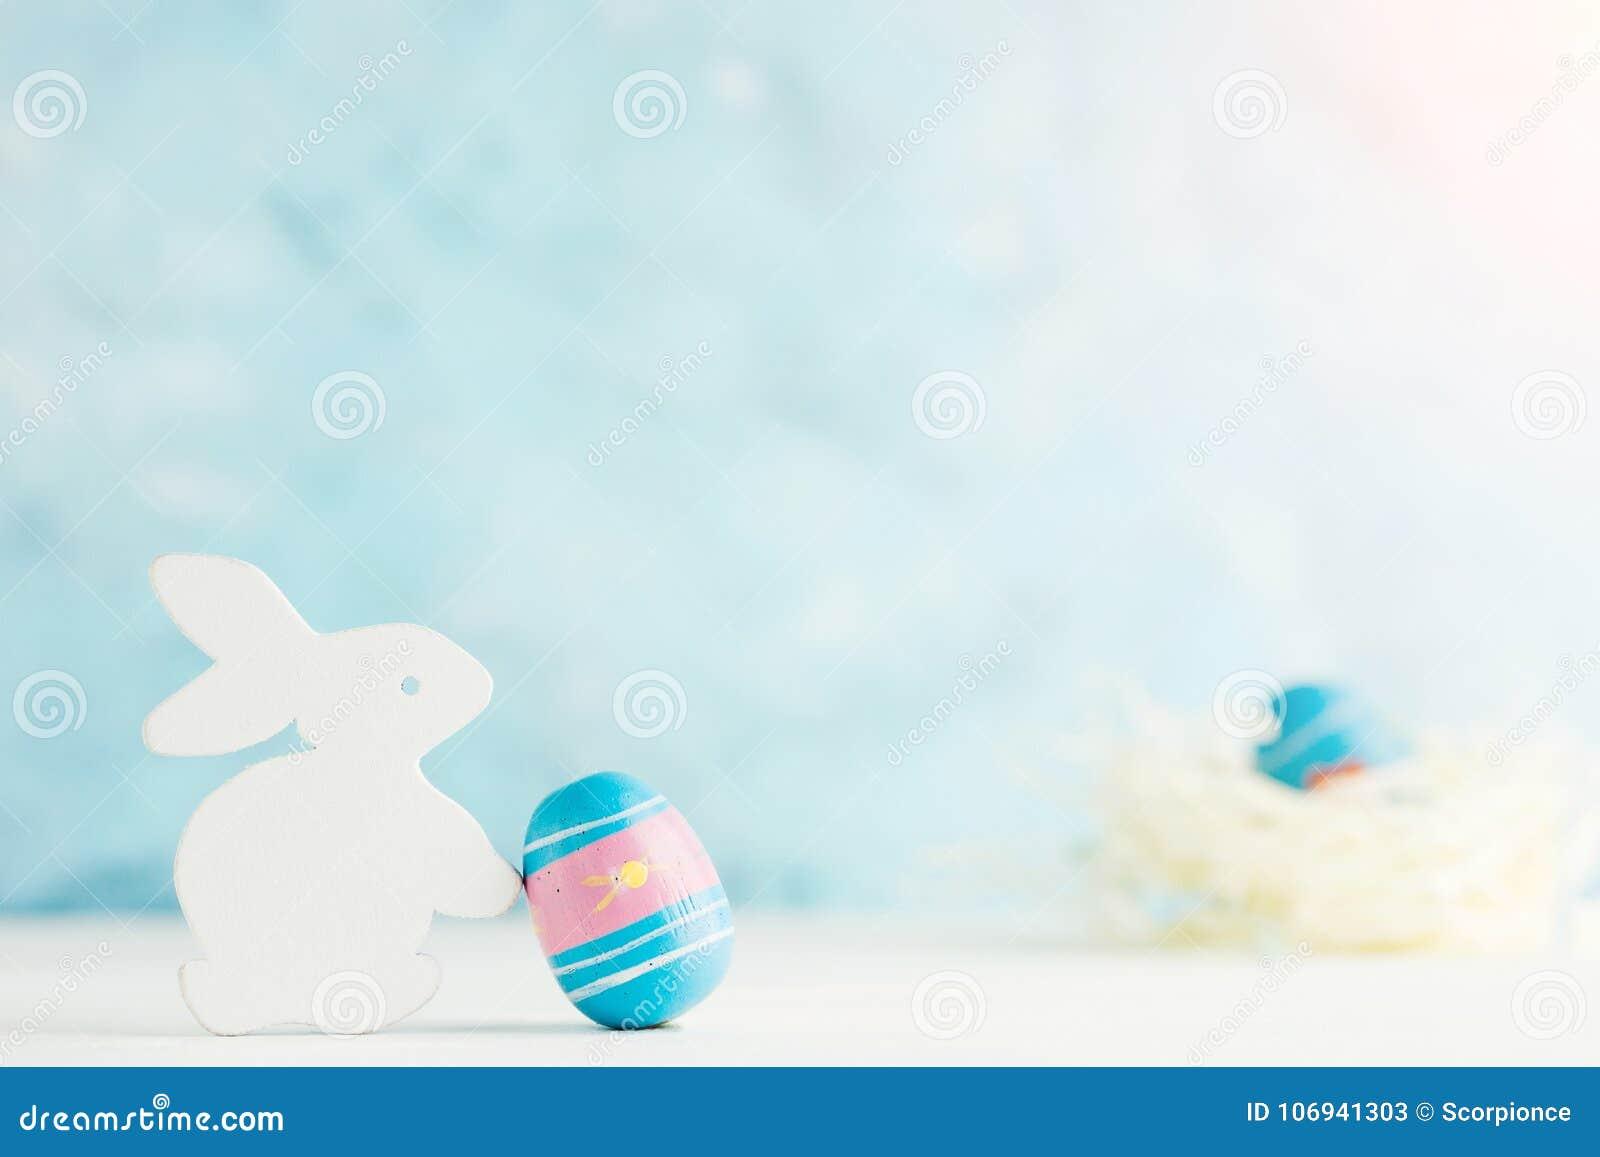 Heldere pasen achtergrond: het witte houten konijntje met paited ei